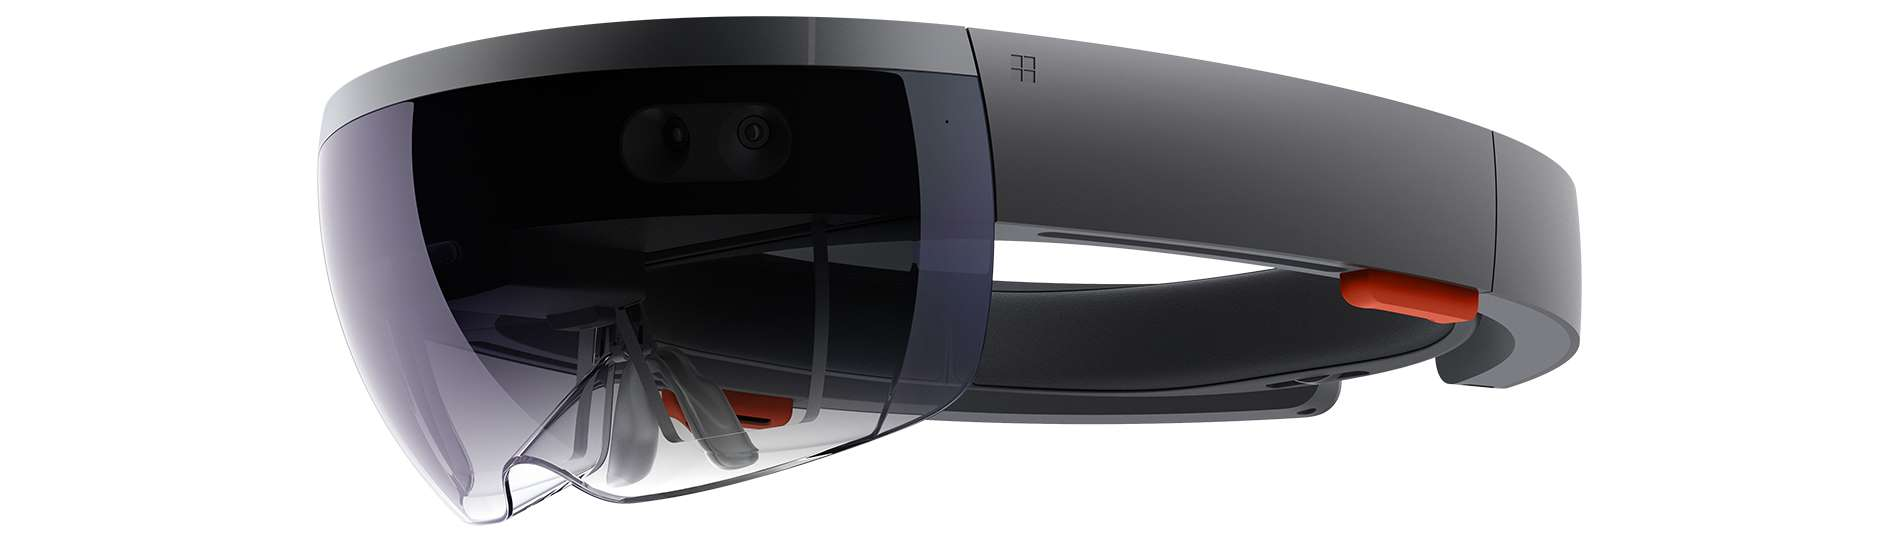 Microsoft va fournir 100 000 casques Hololens à l'armée américaine